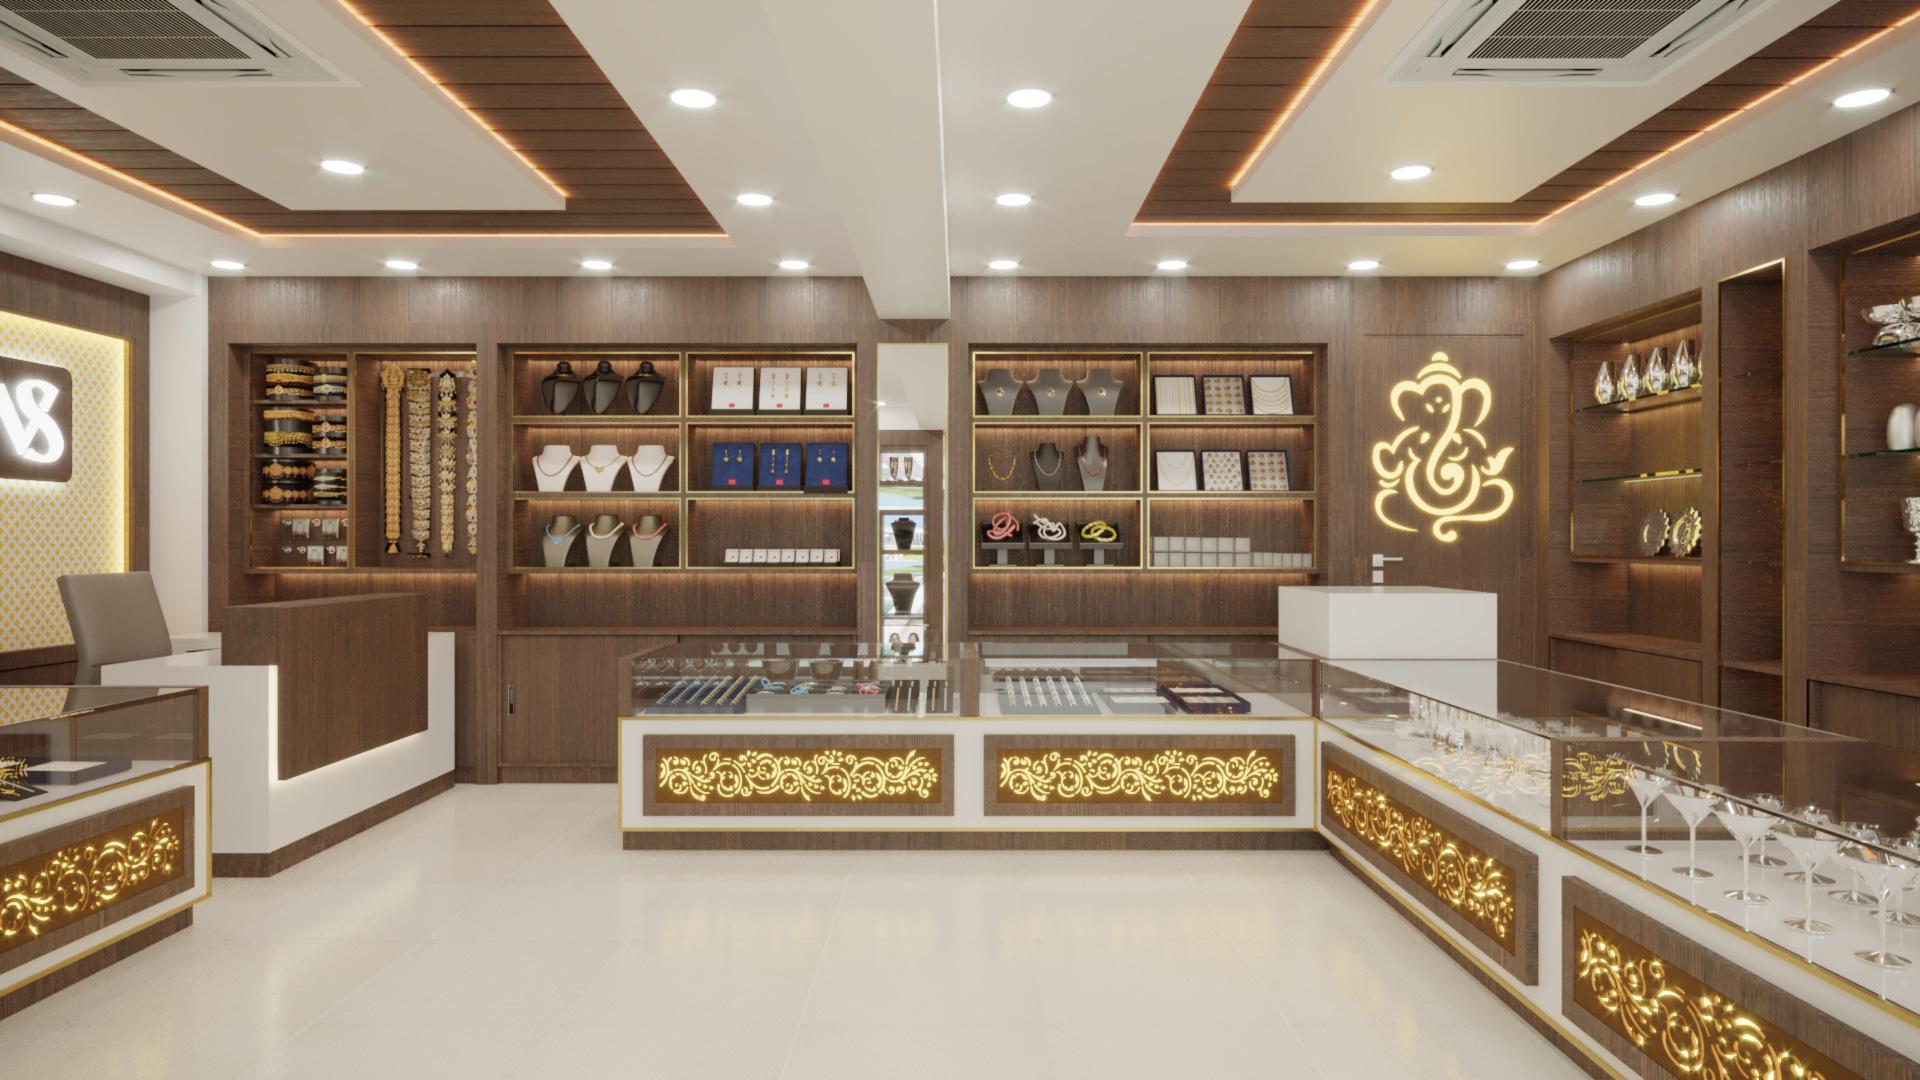 Viswasri Silver Jewelry Shop Interior